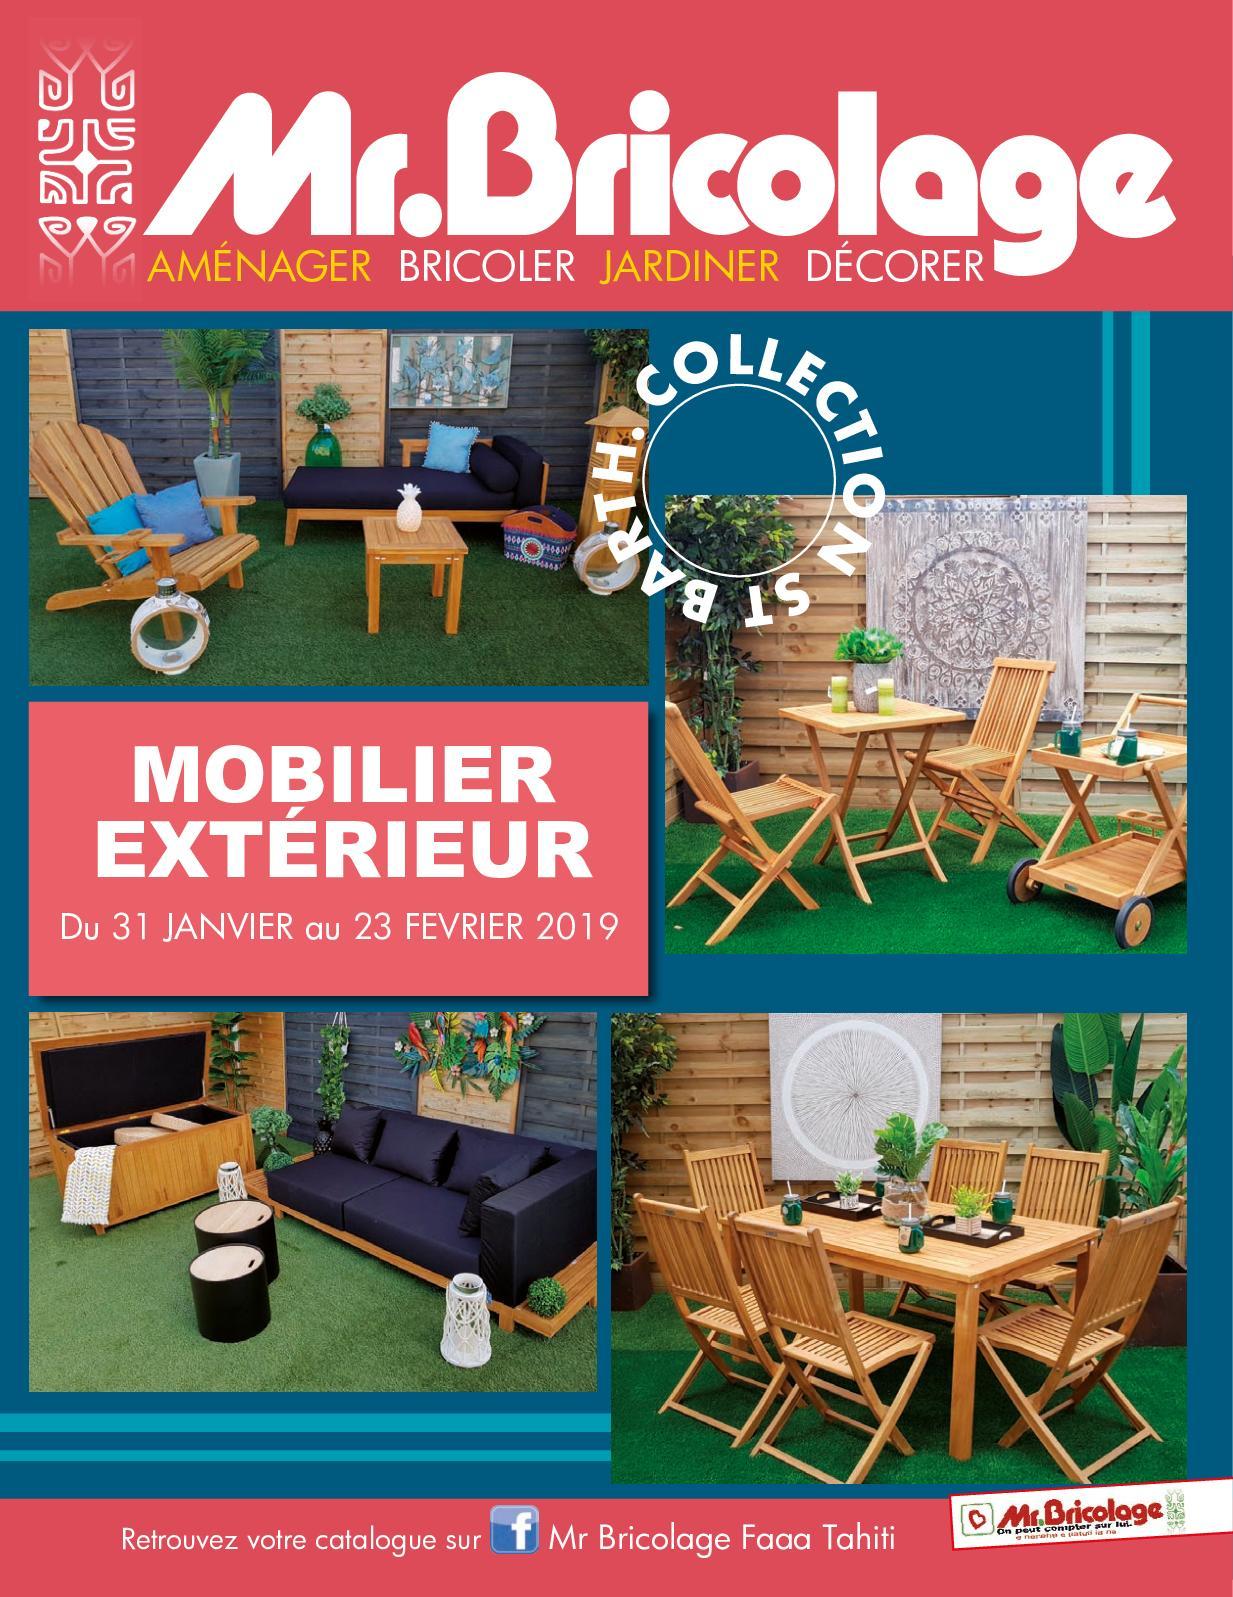 Calaméo - Mr Bricolage Mobilier à Salon De Jardin Mr Bricolage